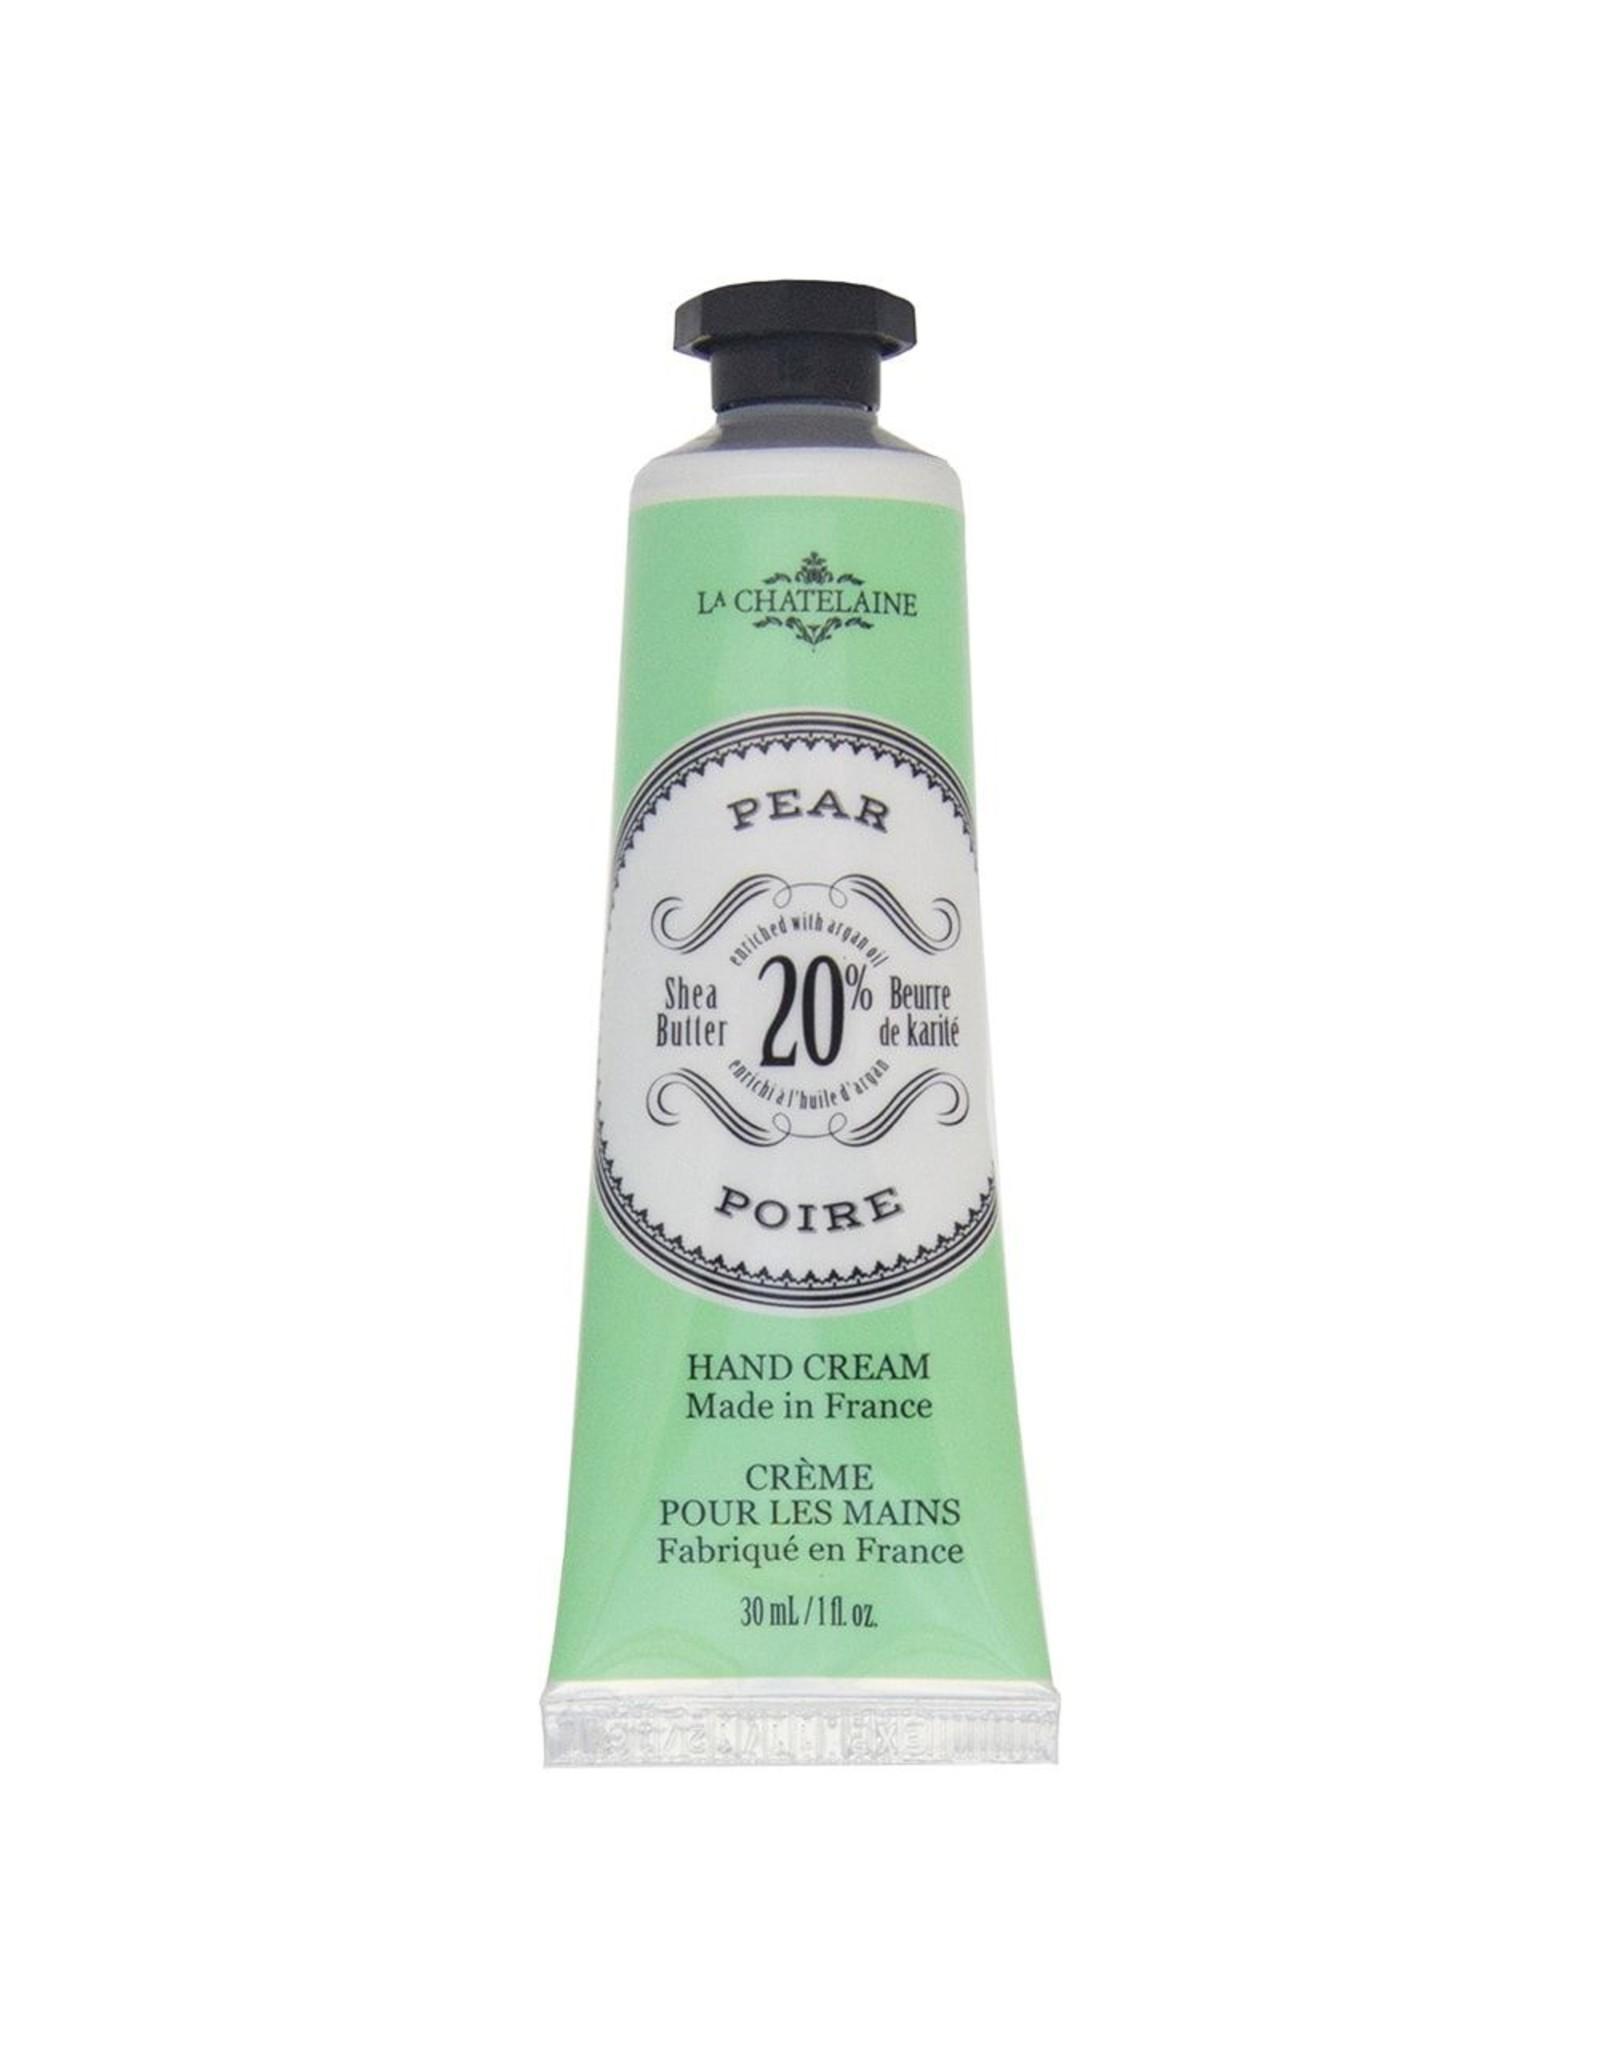 La Chatelaine Pear Hand Cream